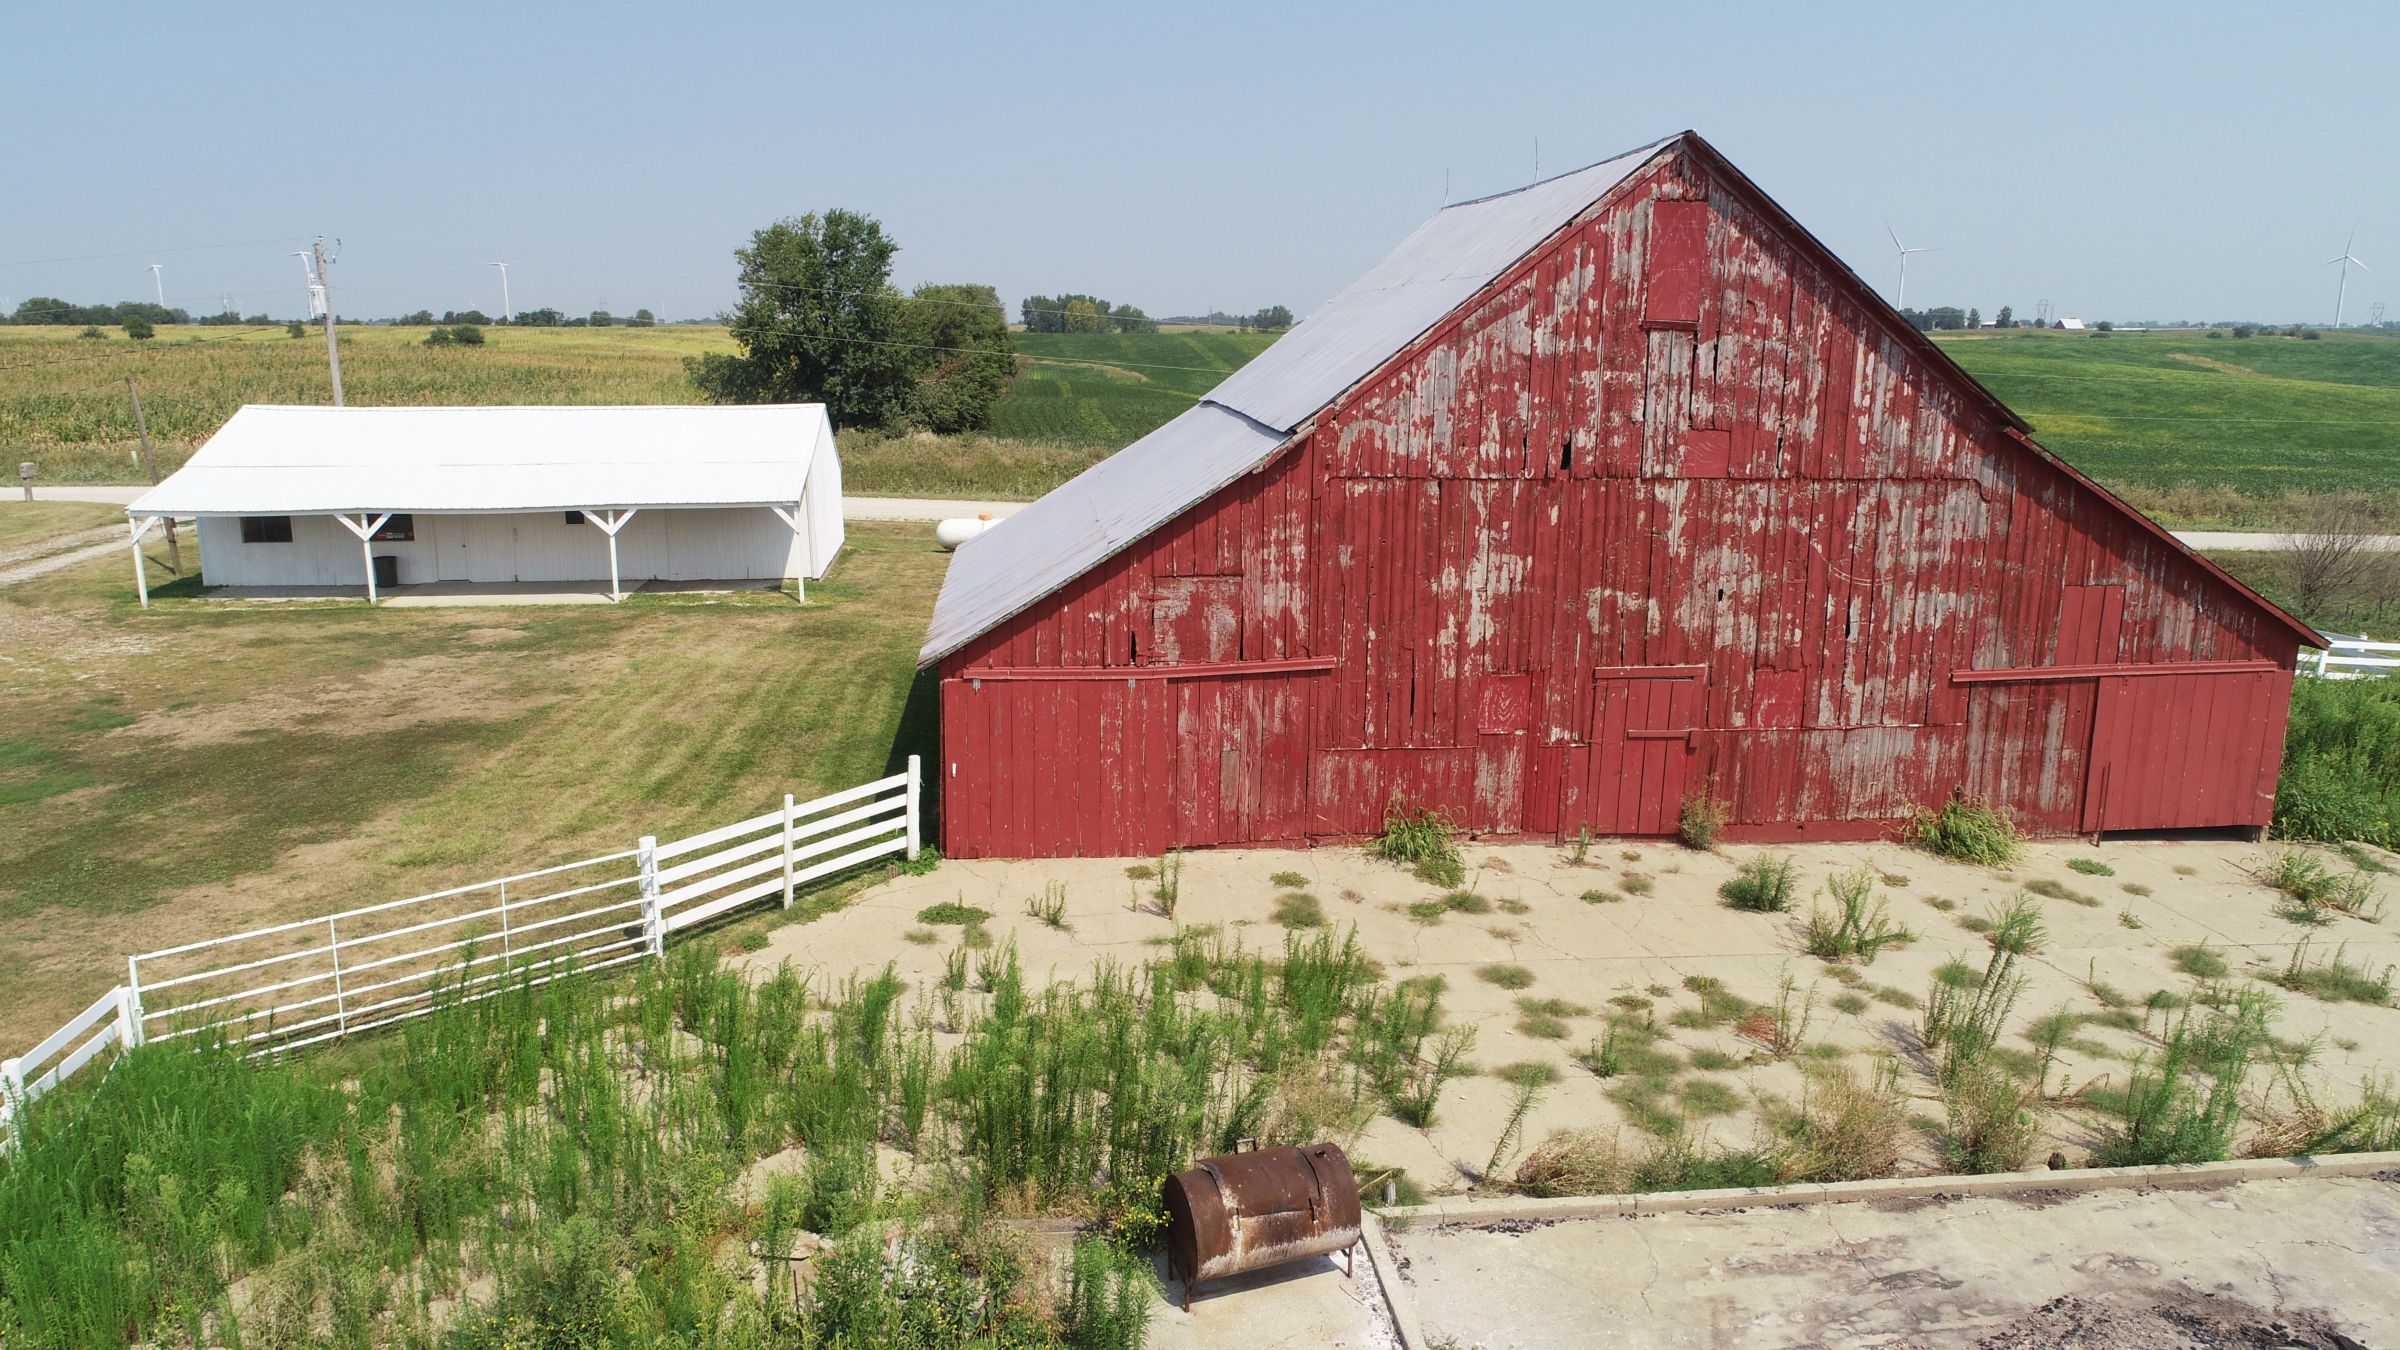 residential-land-poweshiek-county-iowa-5-acres-listing-number-15149-3-2020-08-28-201122.jpg